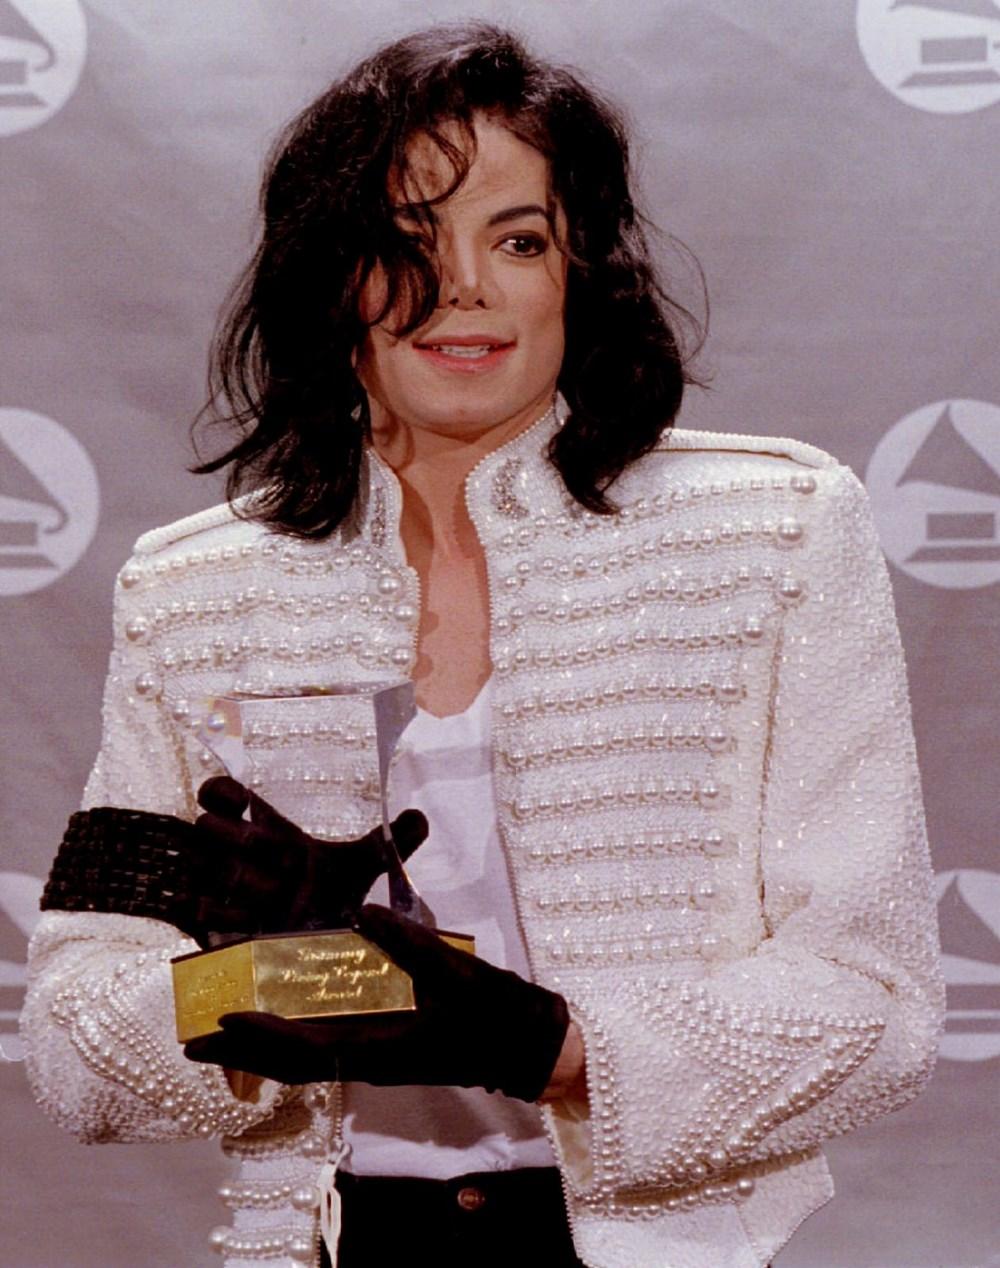 Az bilinen fotoğraflarıyla Michael Jackson - 11